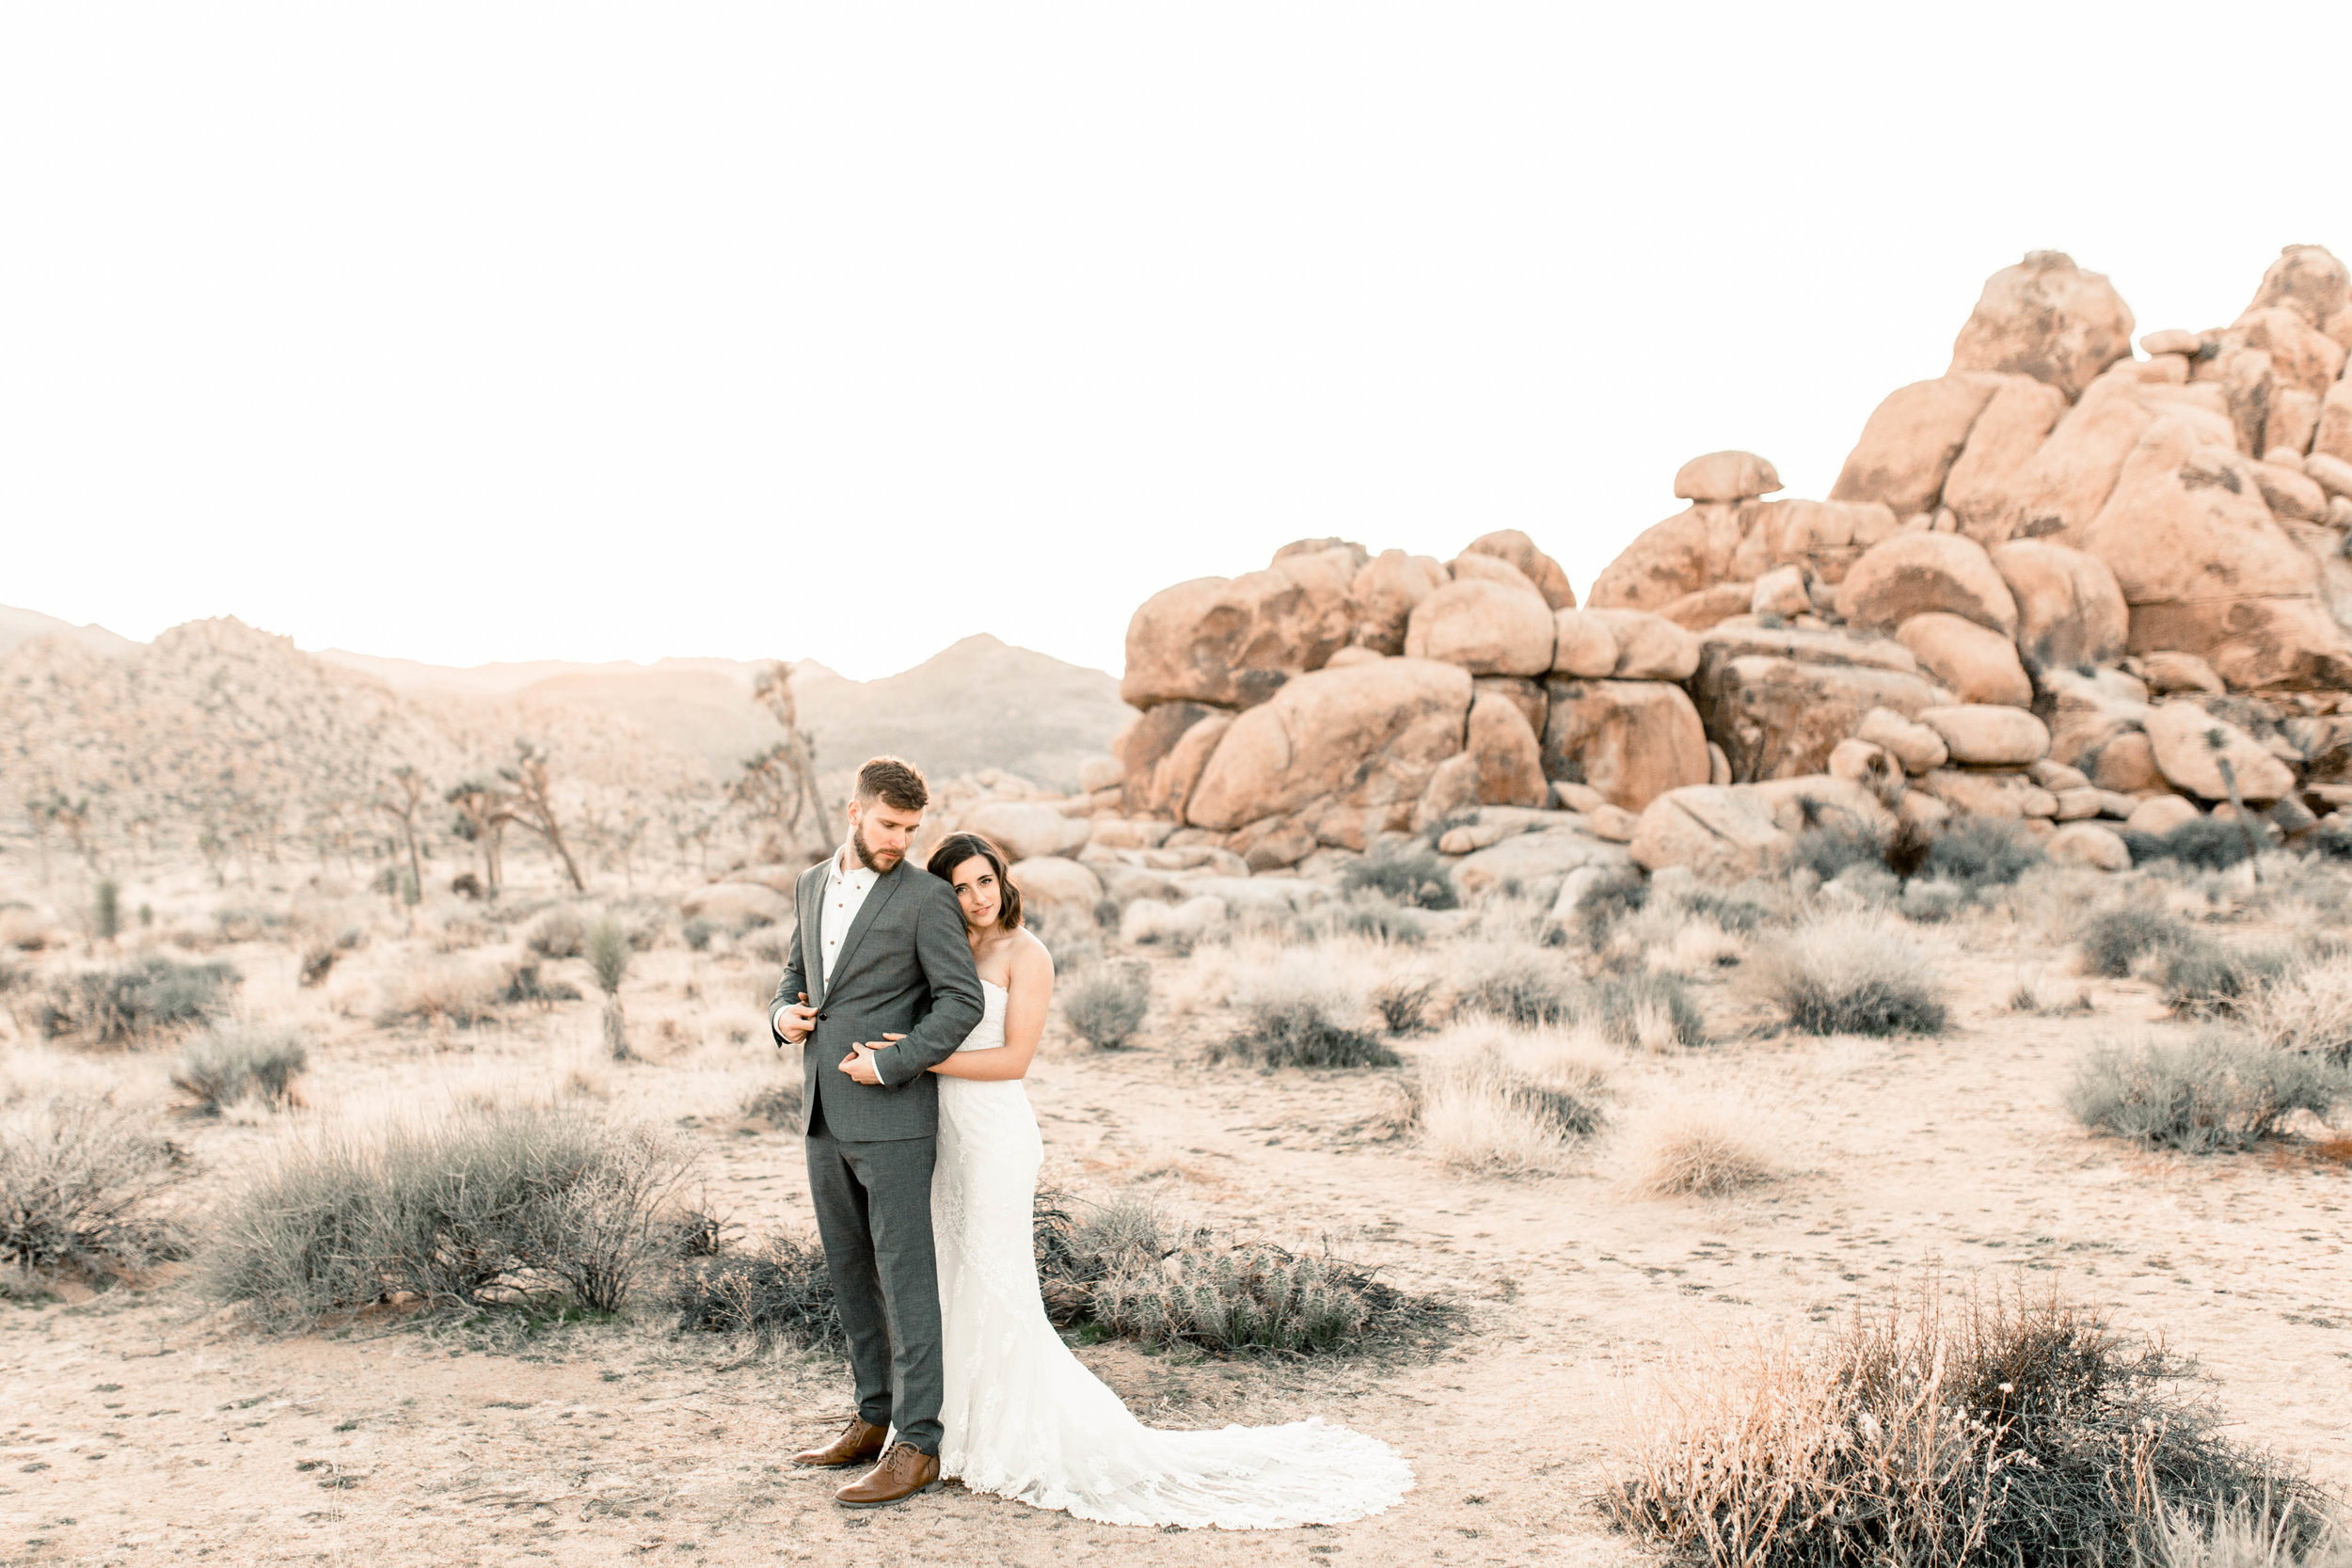 nicole-daacke-photography-joshua-tree-adventurous-elopement-wedding-national-park-wedding-photographer-adventure-wedding-adventurous-elopement-jtree-joshua-tree-national-park-wedding-photographer-intimate-weddings-golden-desert-love-35.jpg